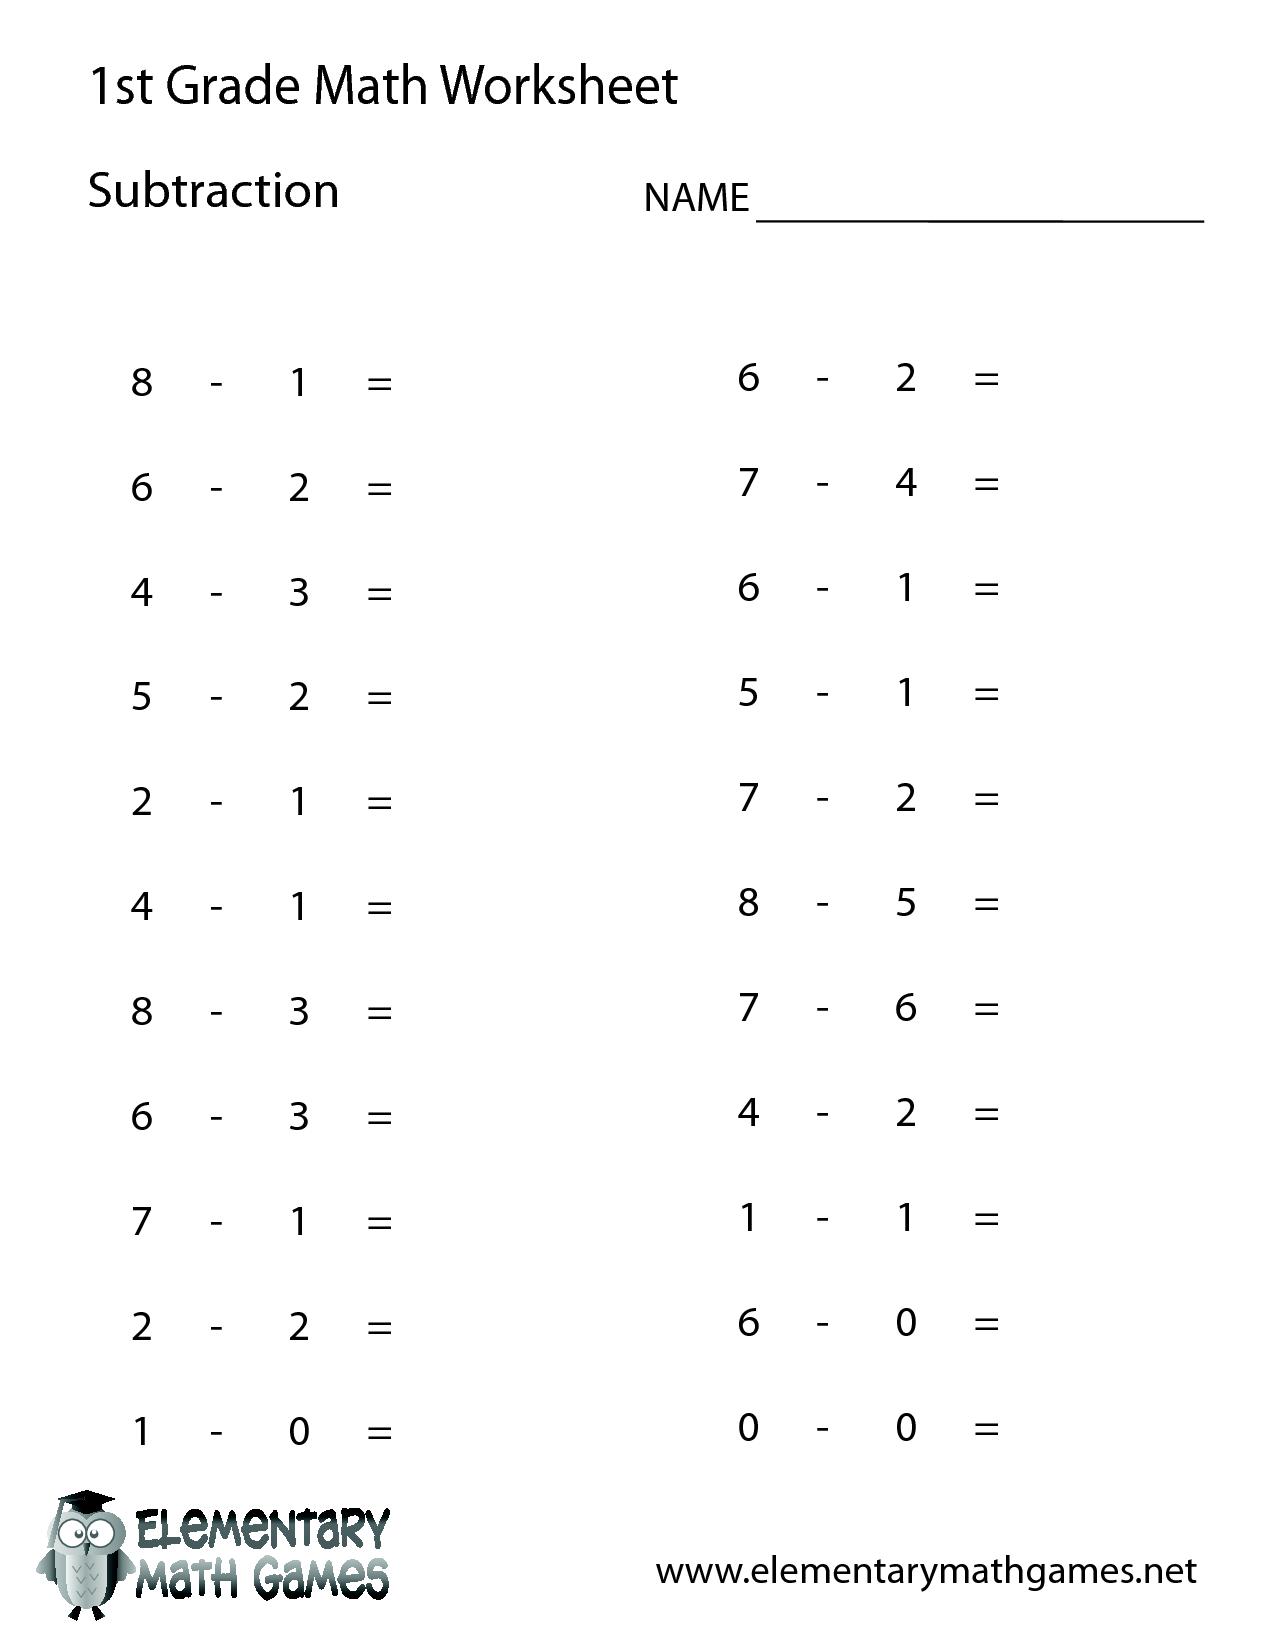 1St Grade Math Worksheets | 1St Grade Math | 1St Grade Math | Free Printable Addition Worksheets For 1St Grade